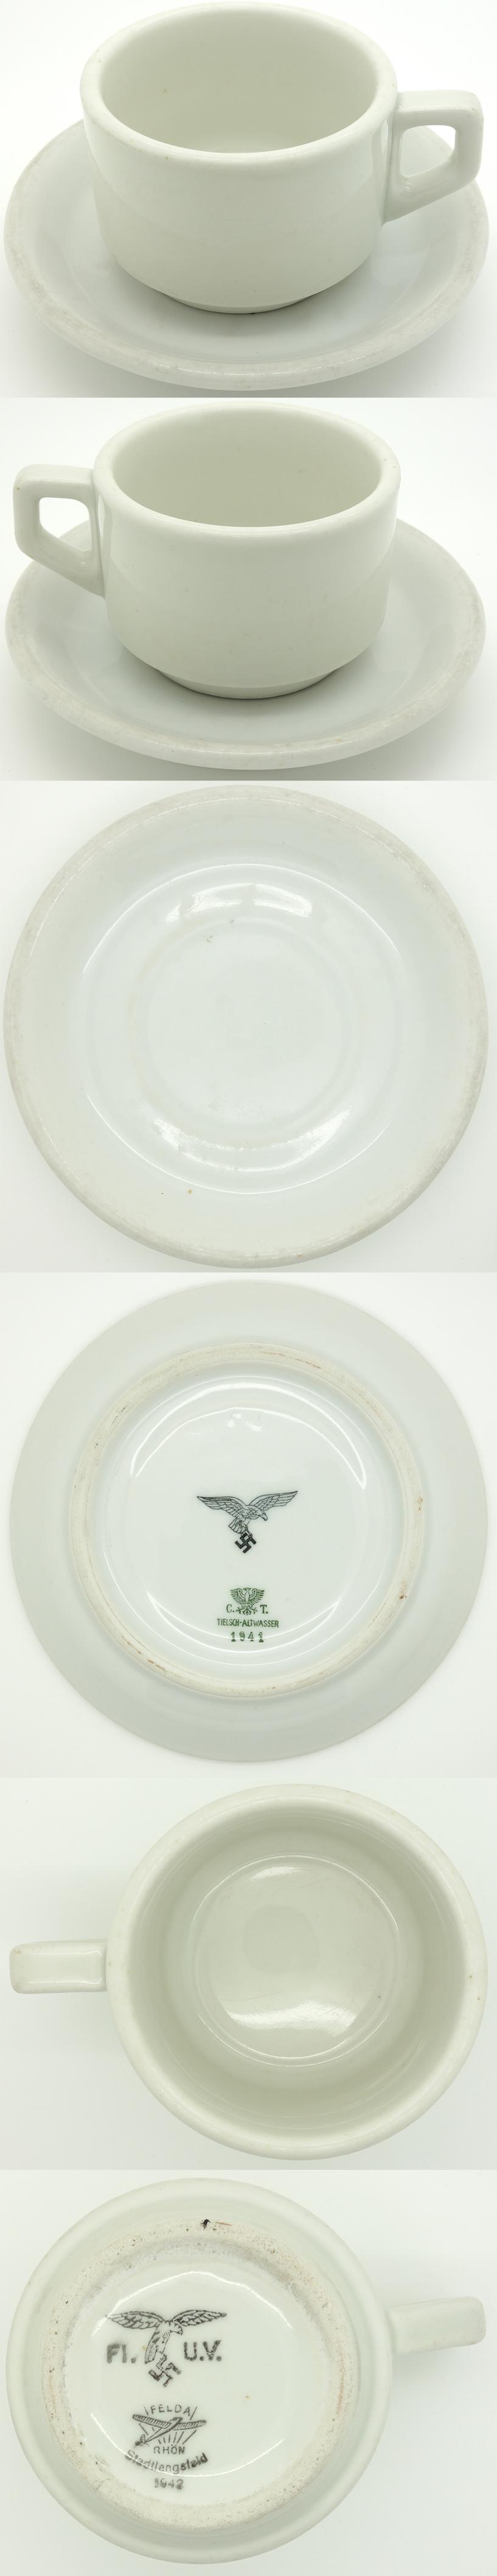 Luftwaffe Cup and Saucer